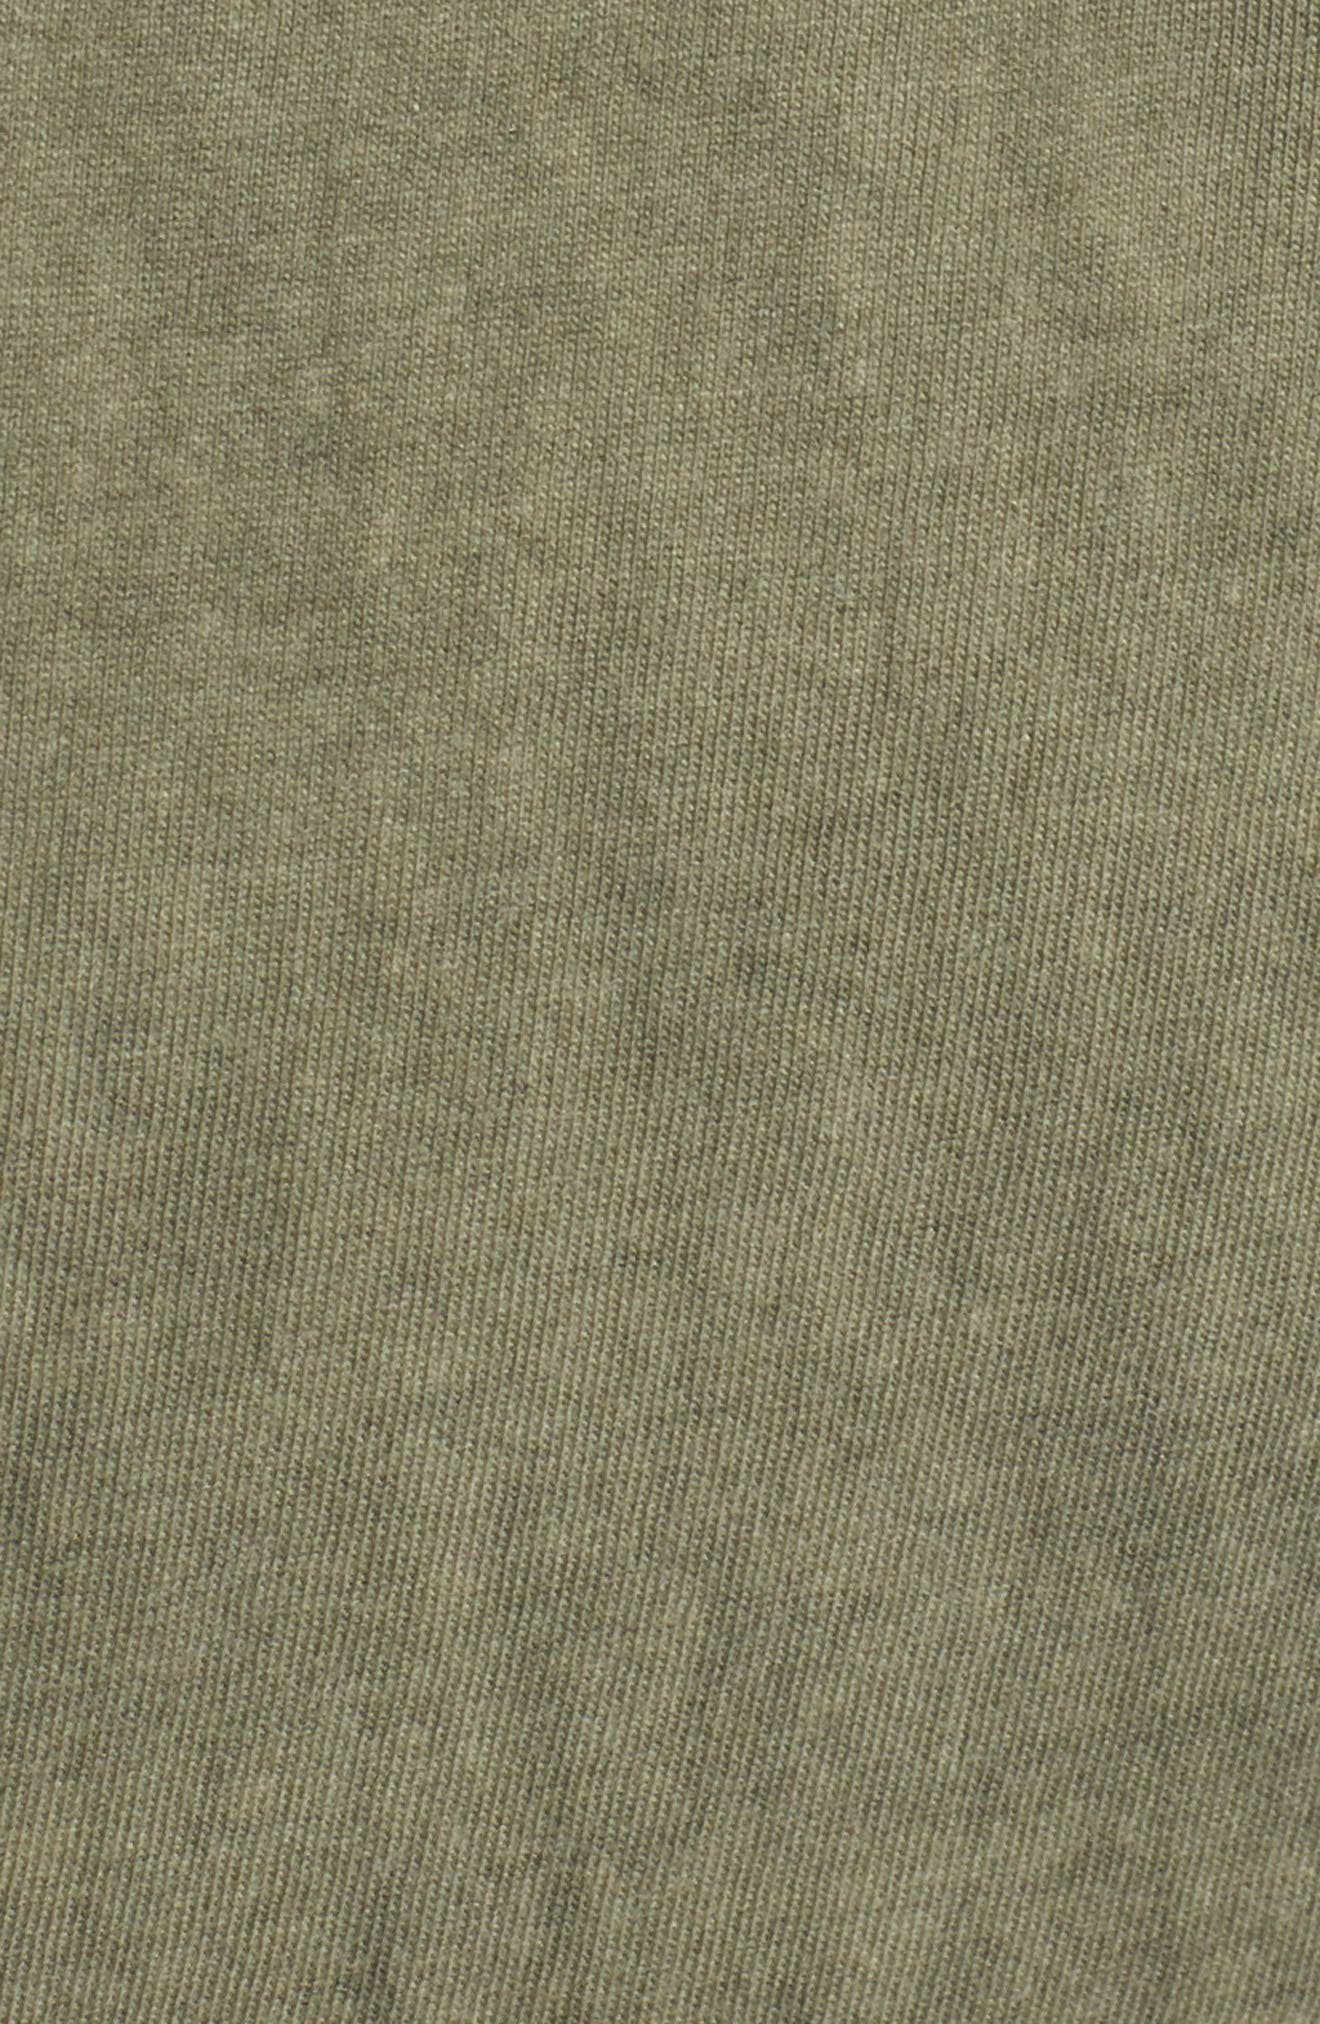 Scoop Neck Body-Con Dress,                             Alternate thumbnail 5, color,                             304